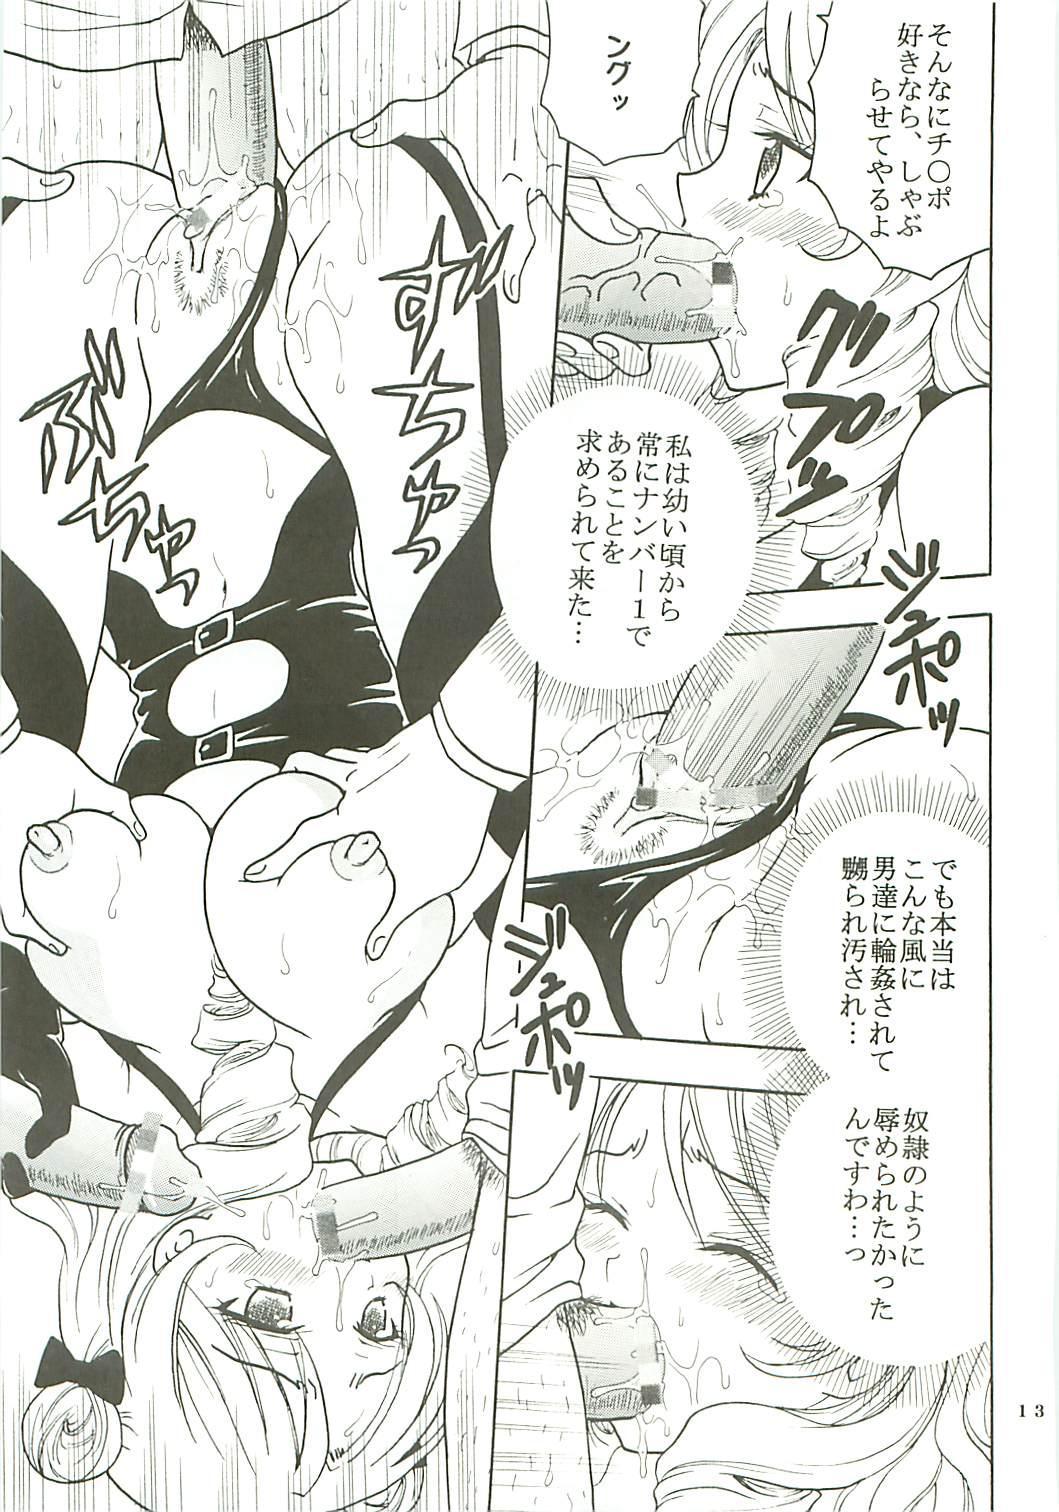 ToLOVE Ryu Vol. 7 13